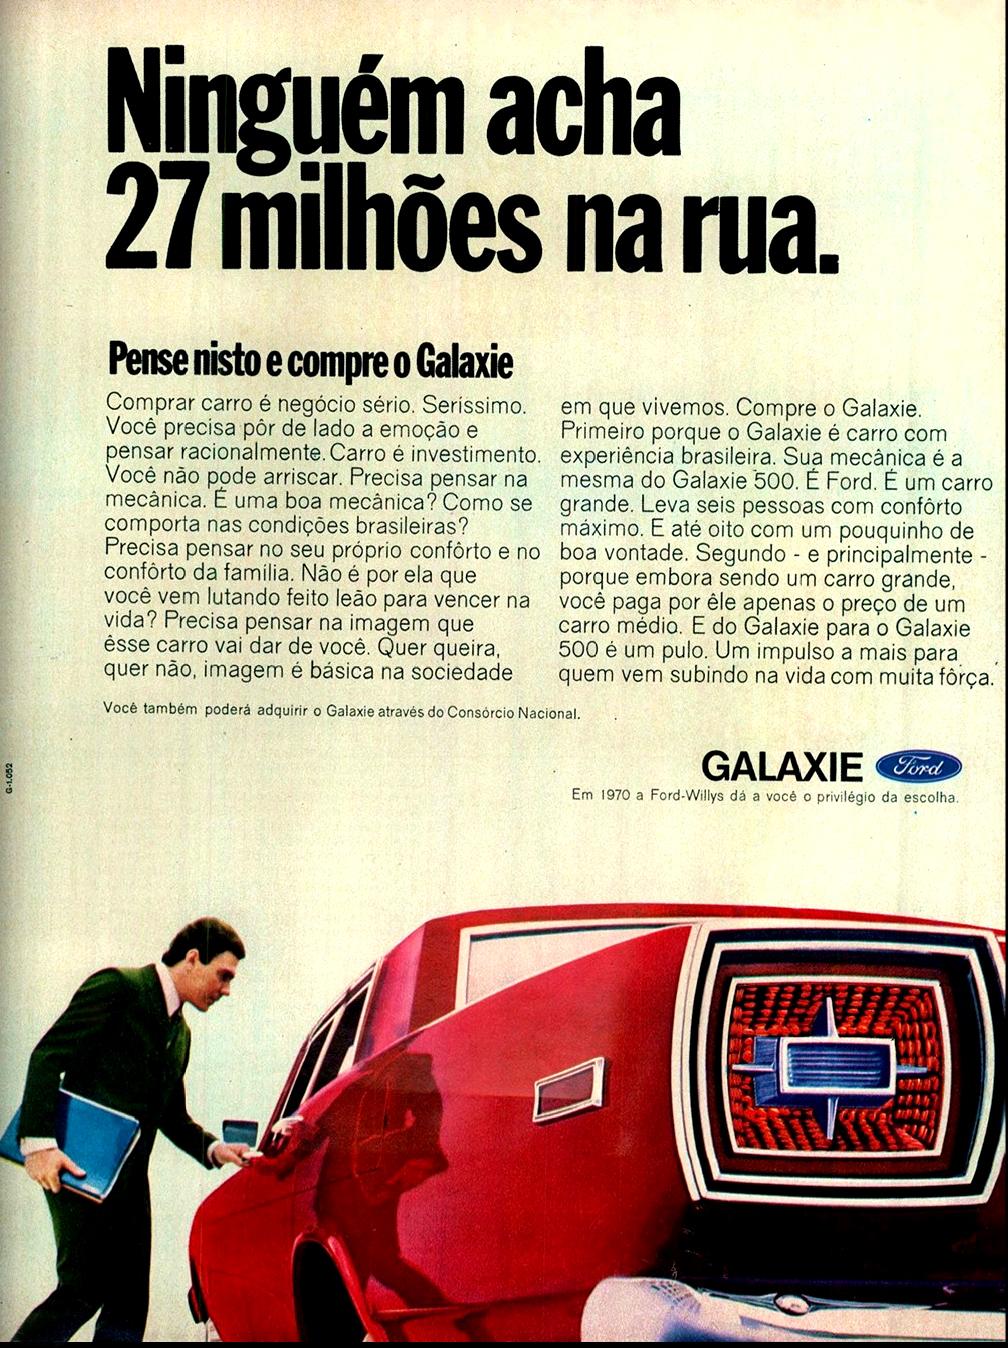 Propaganda antiga da Ford promovendo o Galaxie em 1970